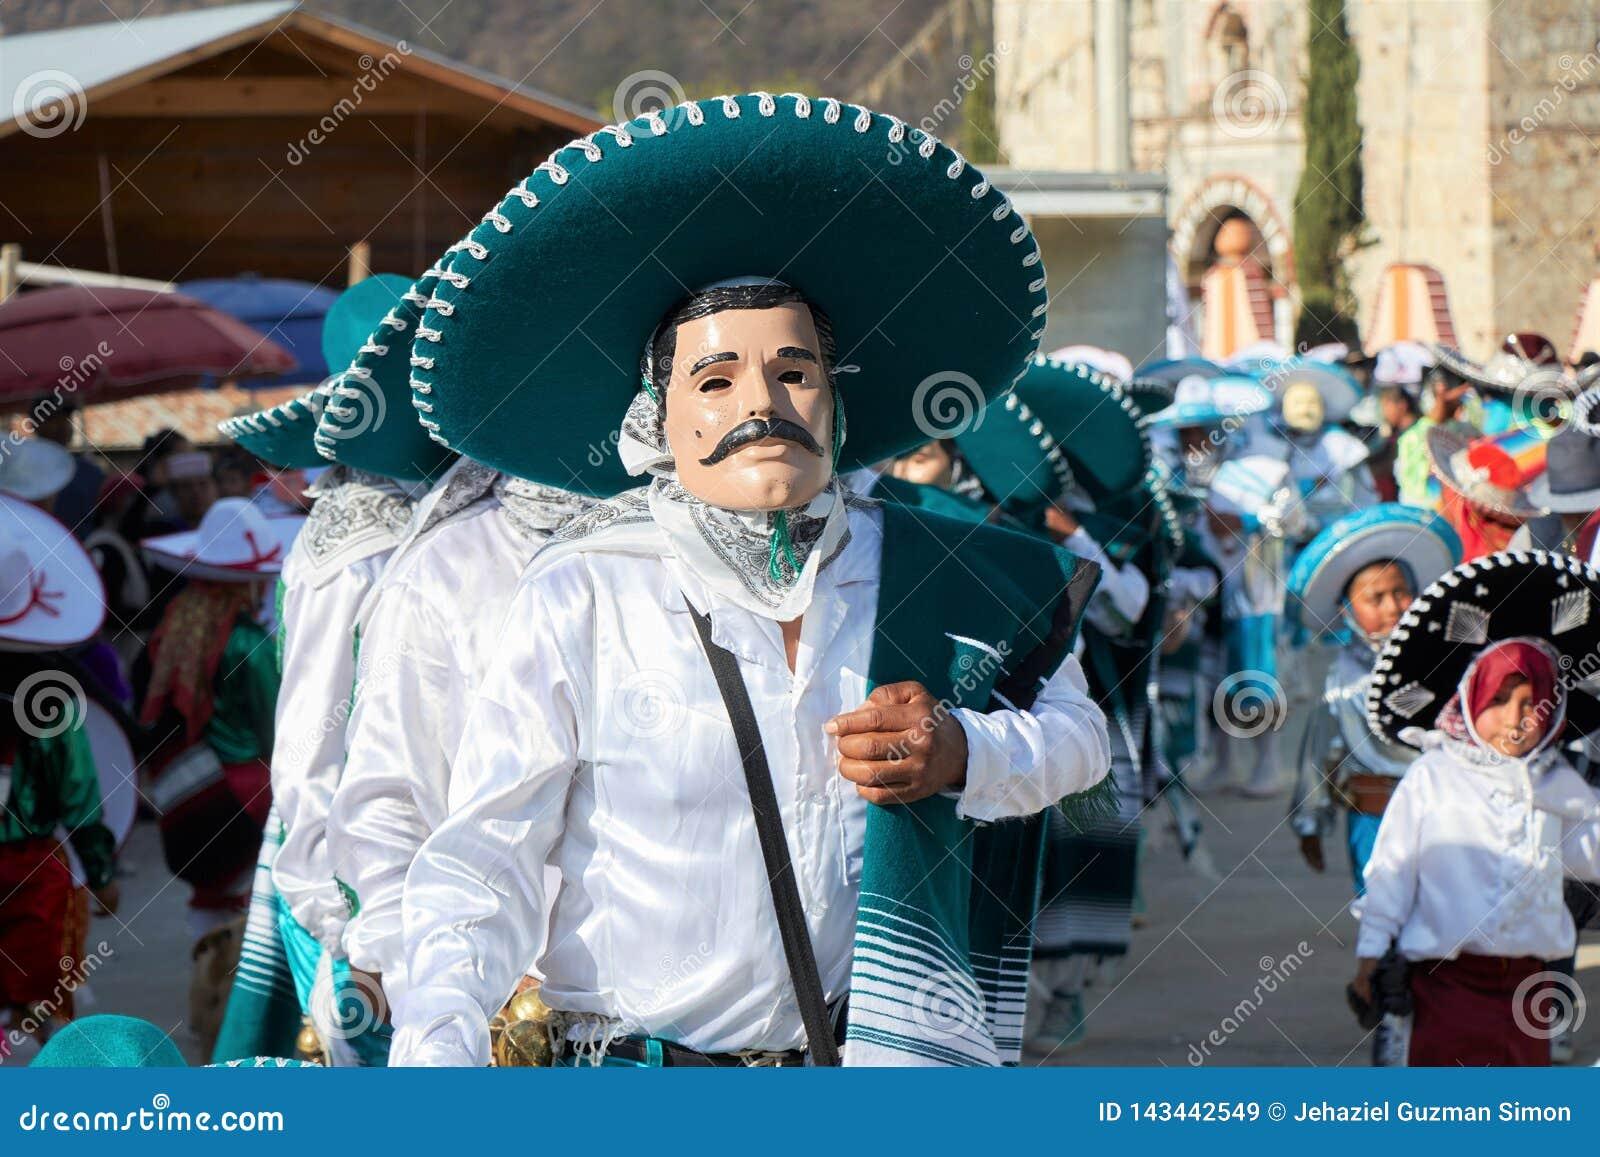 Persoon die masker dragen die en als mariachi met donkergroene hoed tijdens a vermomt